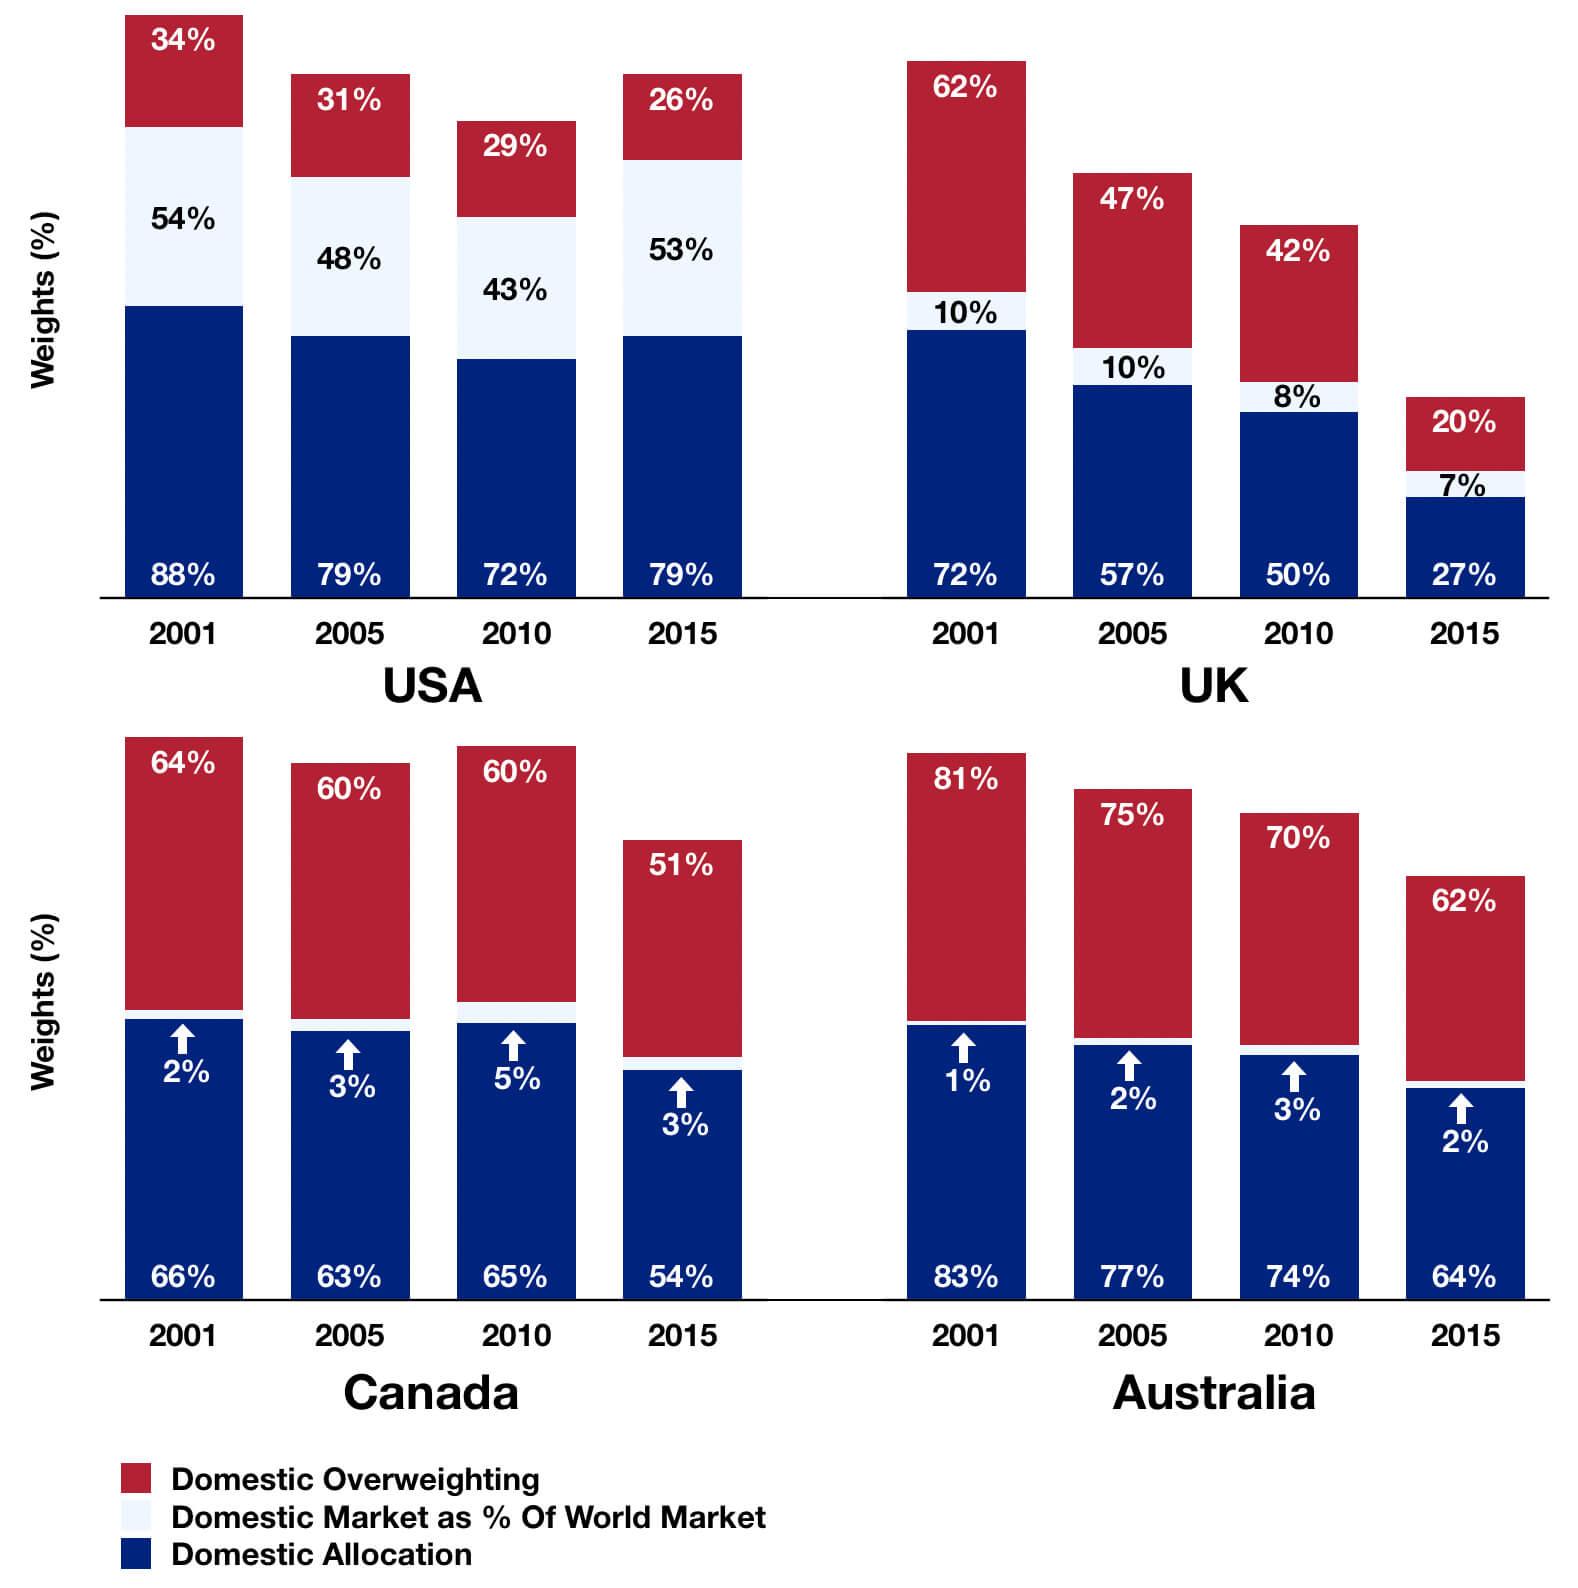 Home Bias Reduction Over Time: USA, UK, Canada and Australia